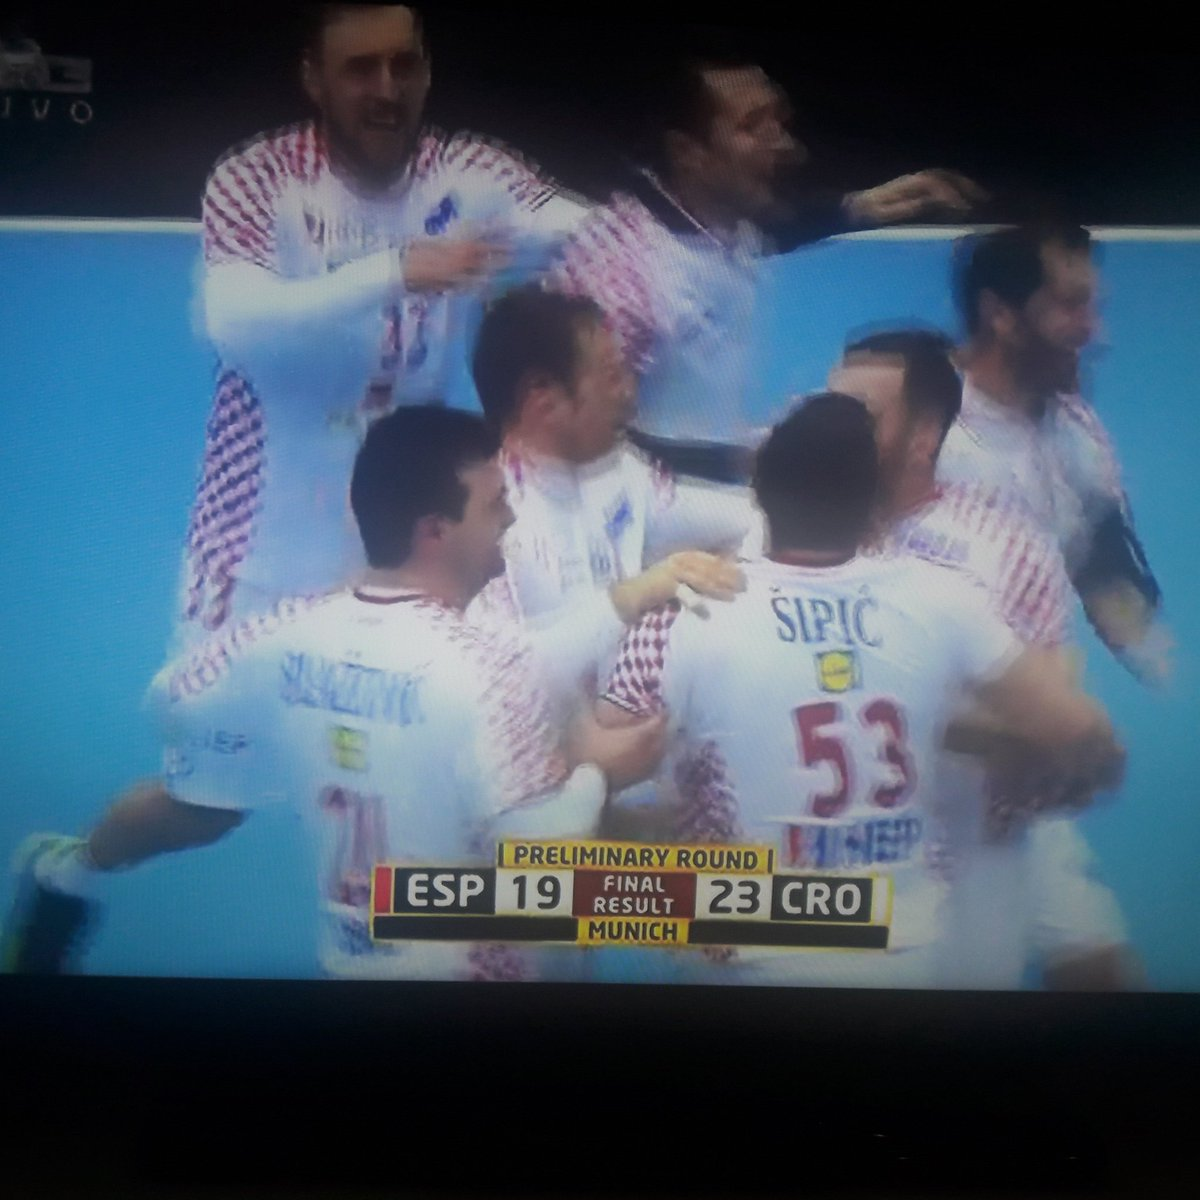 RT @BojciZg: Bravoooo @HRStwitt @HorvatZlatko !! #victory #HandballWM2019 #proudtobeCroat #iznadsvihHrvatska https://t.co/WjLN7T0HZZ